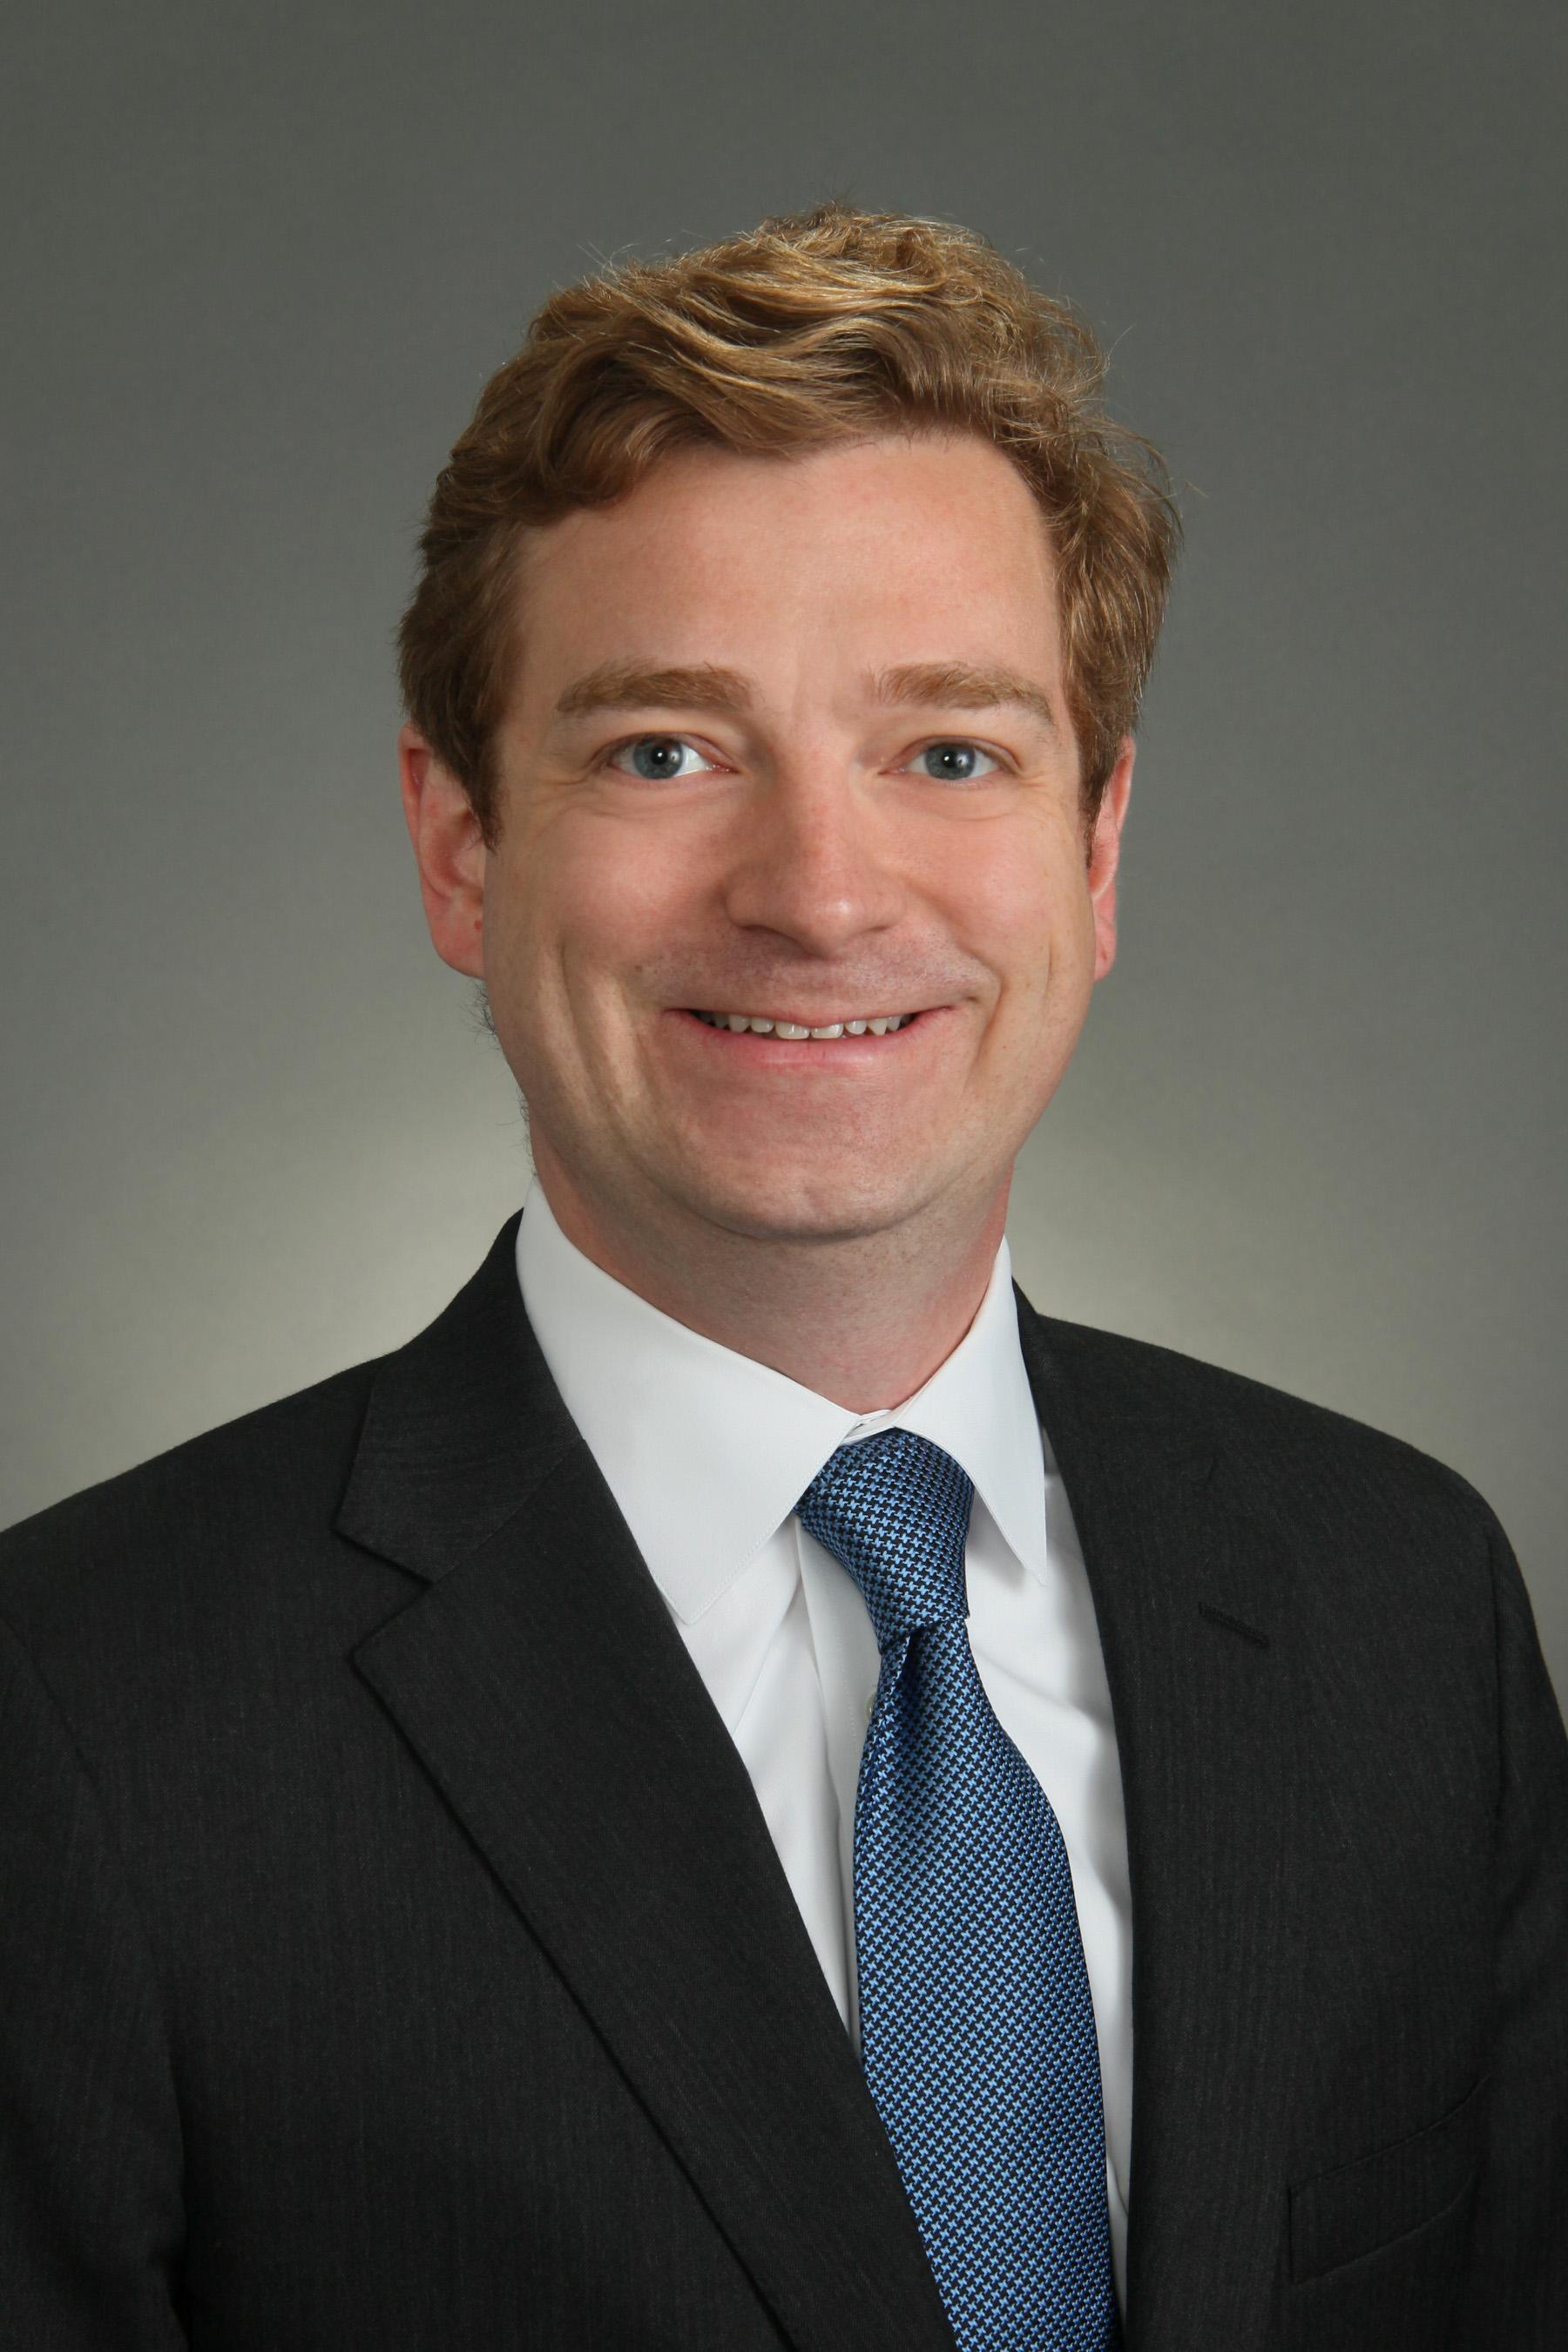 Christopher R. Sweeney